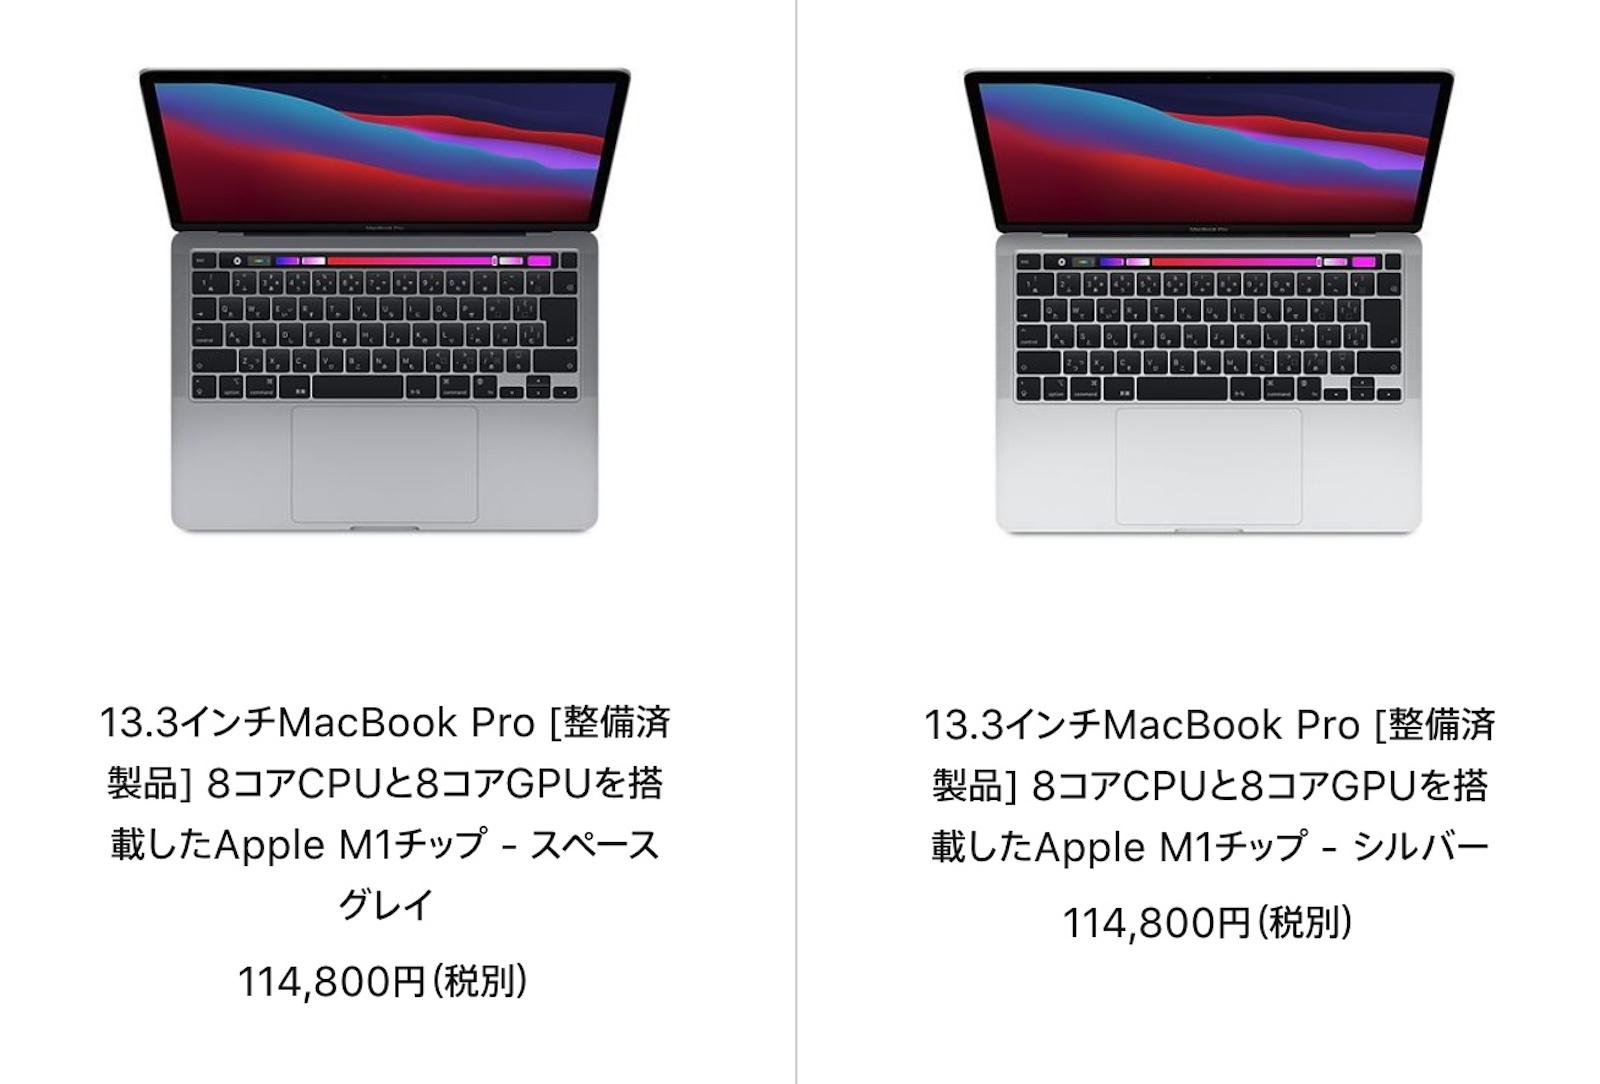 M1 macbook pro refurbished